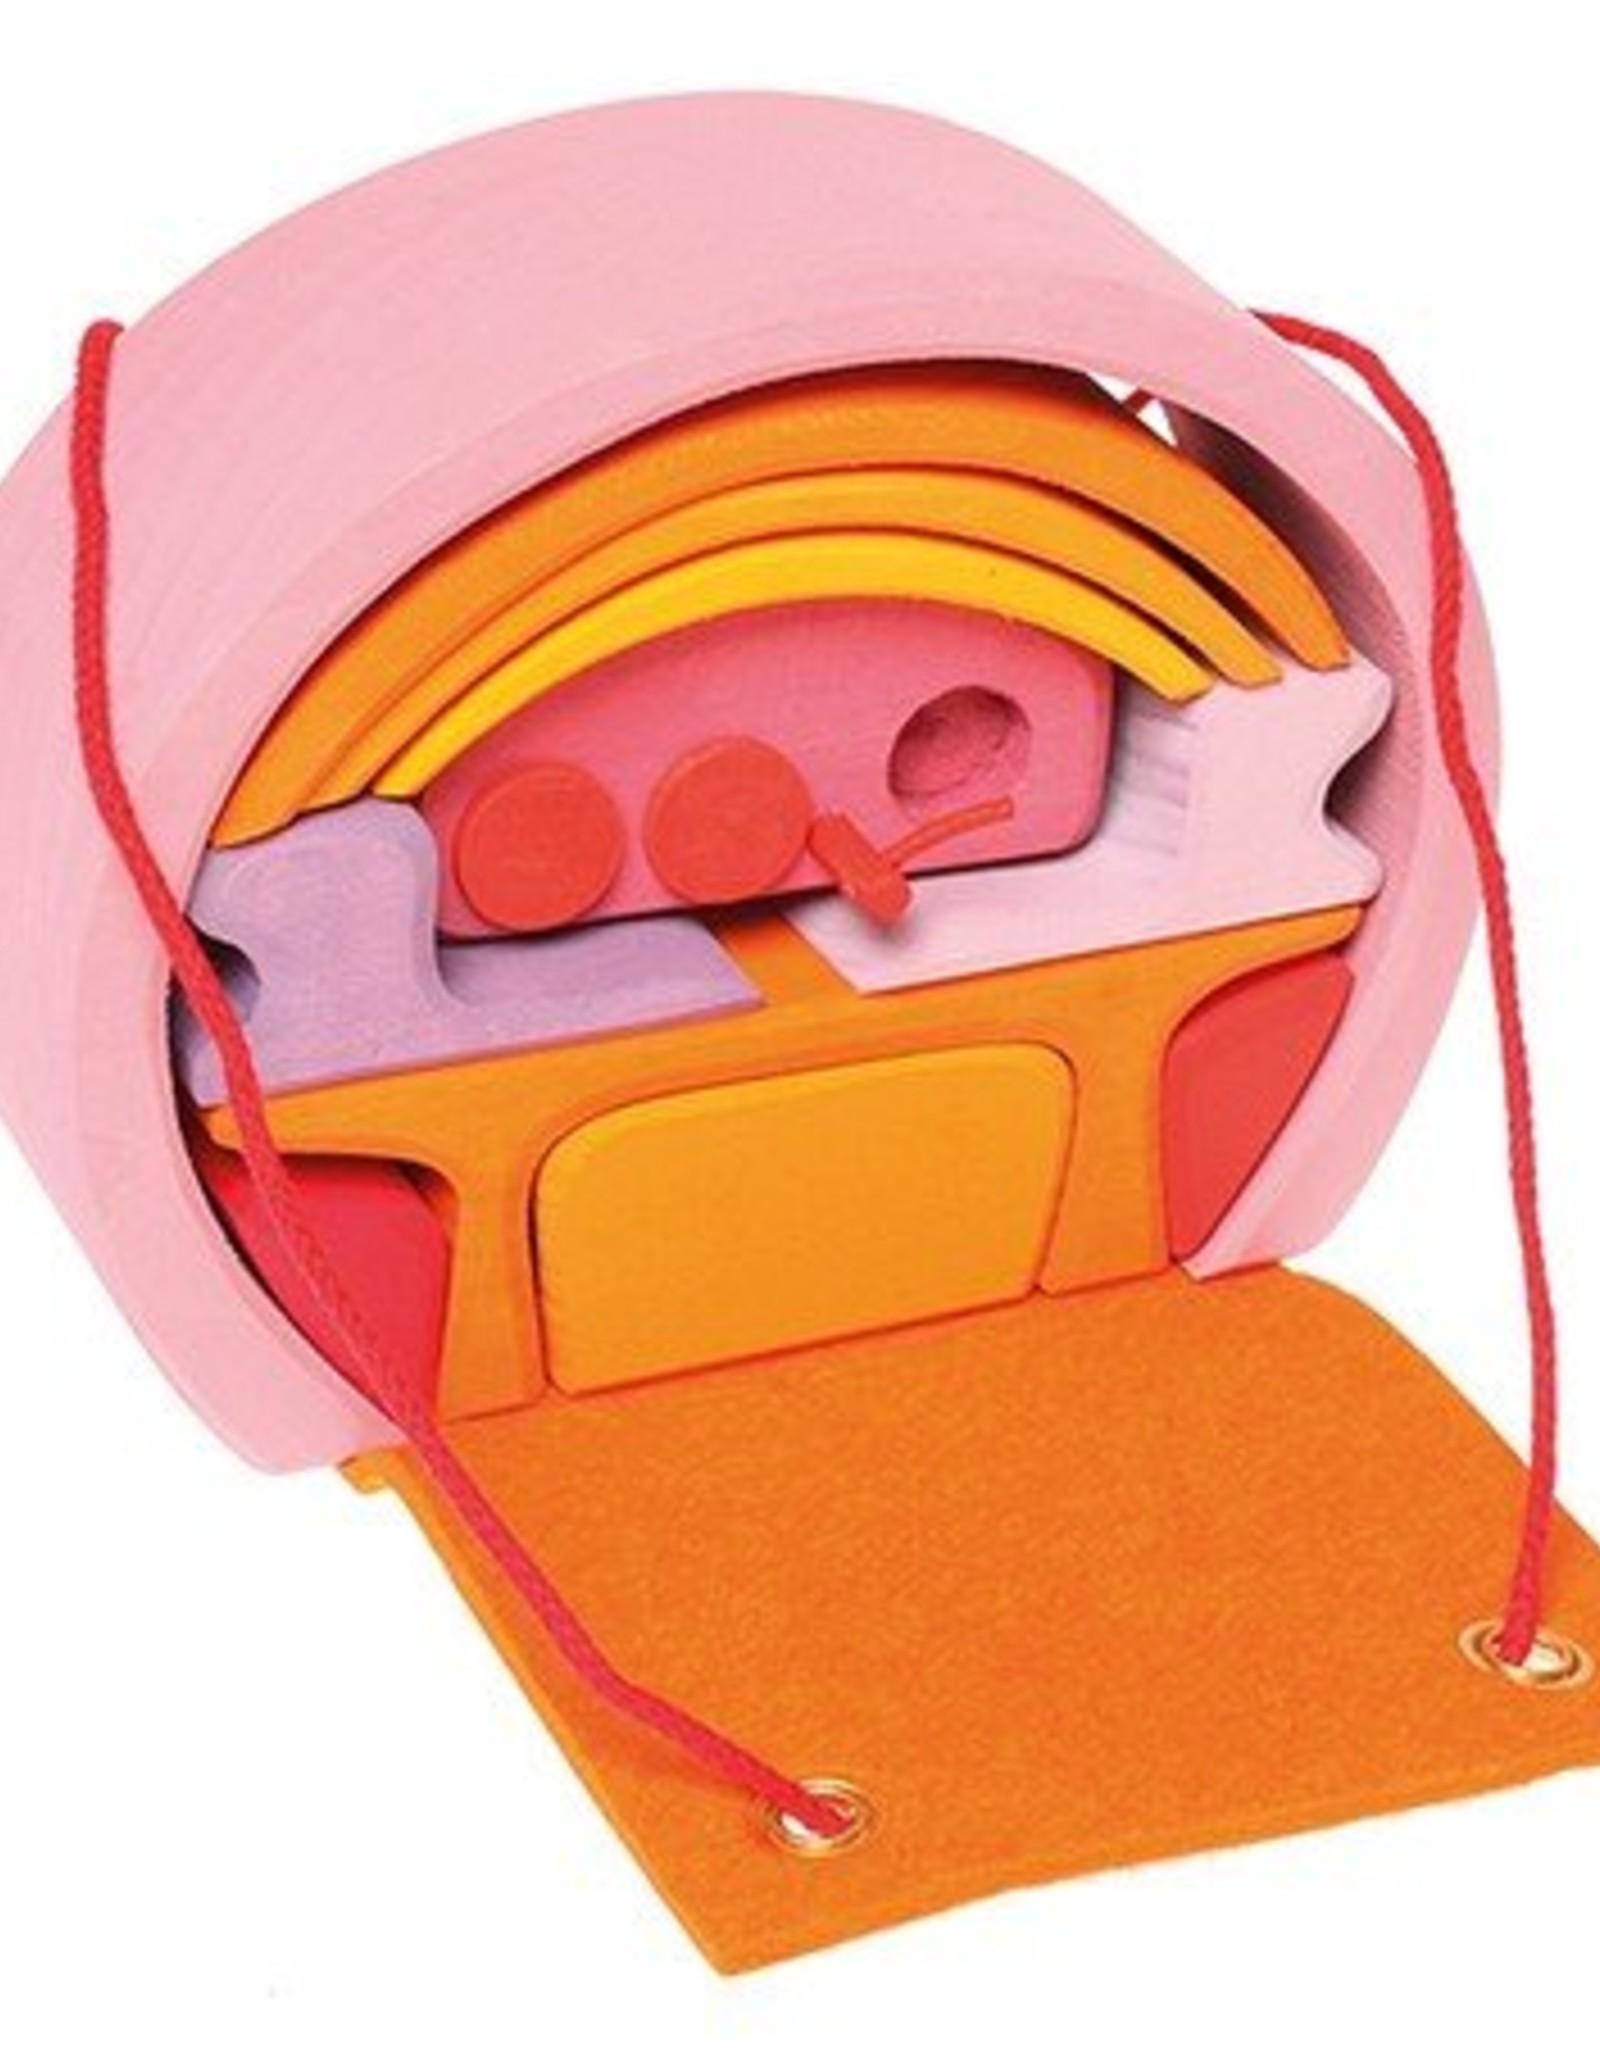 Grimm's Grimm's - Mobile Home - Pink/Orange